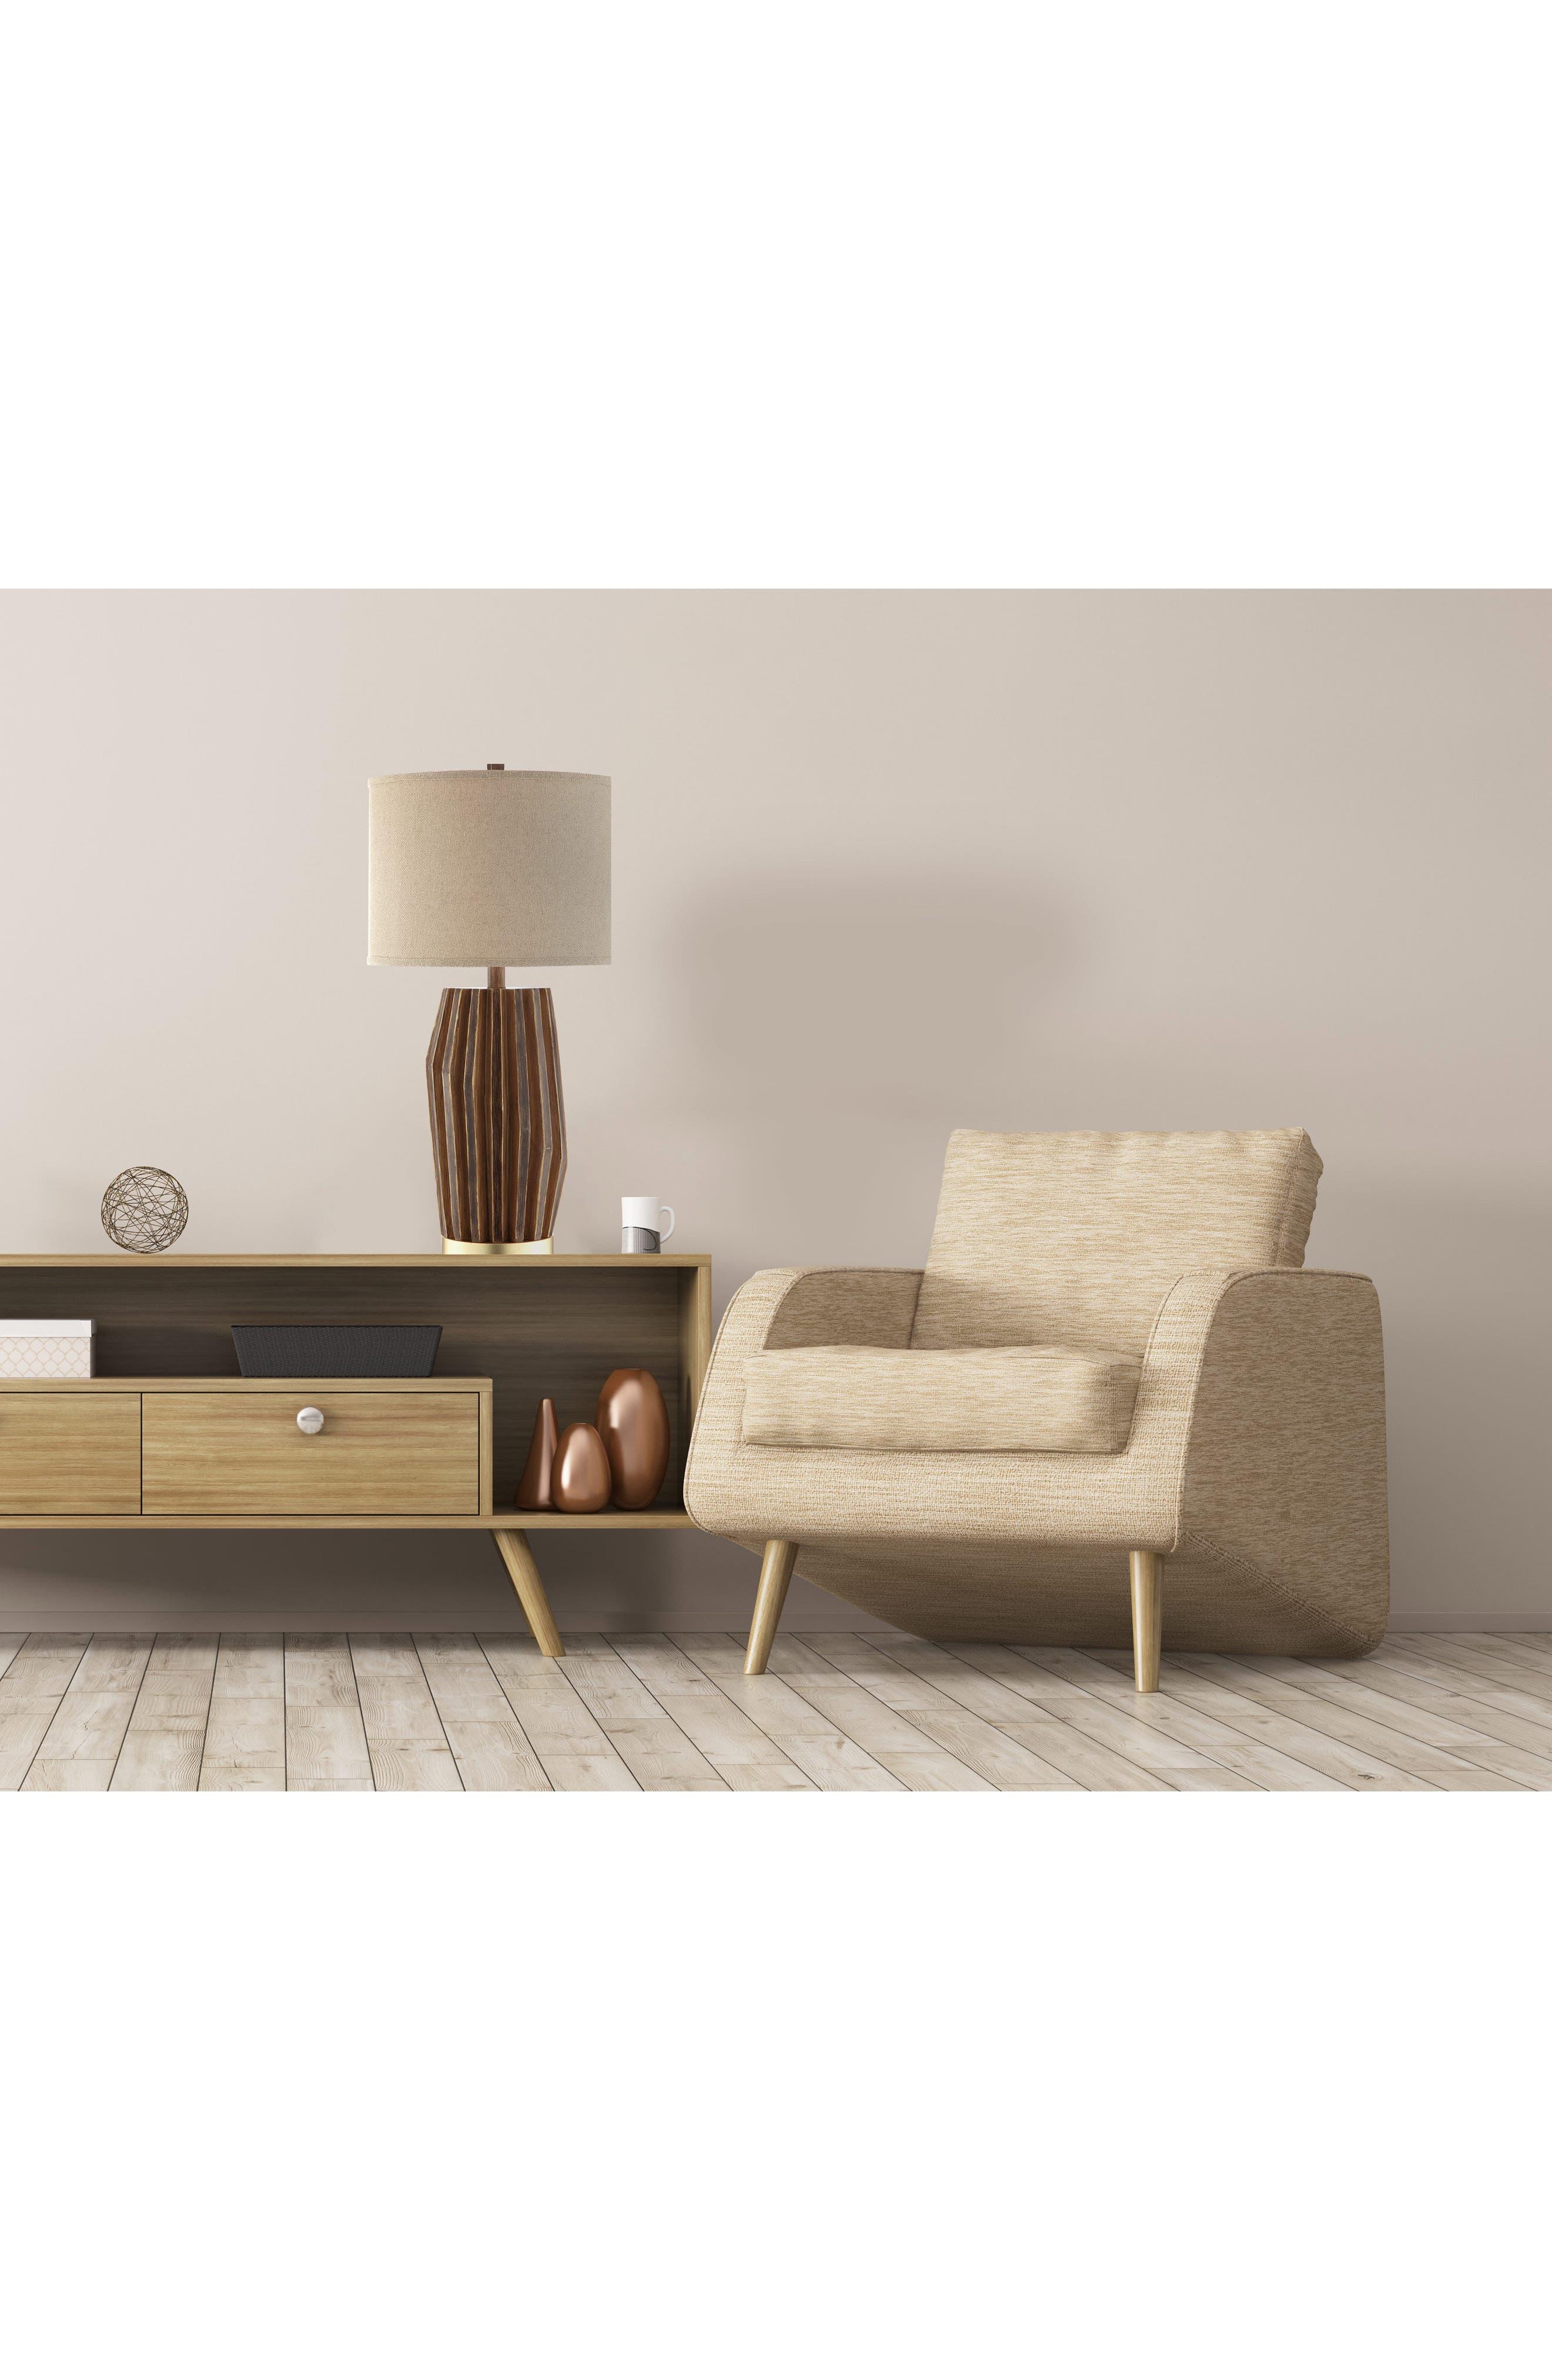 JAlexander Easton Table Lamp,                             Alternate thumbnail 2, color,                             Wood